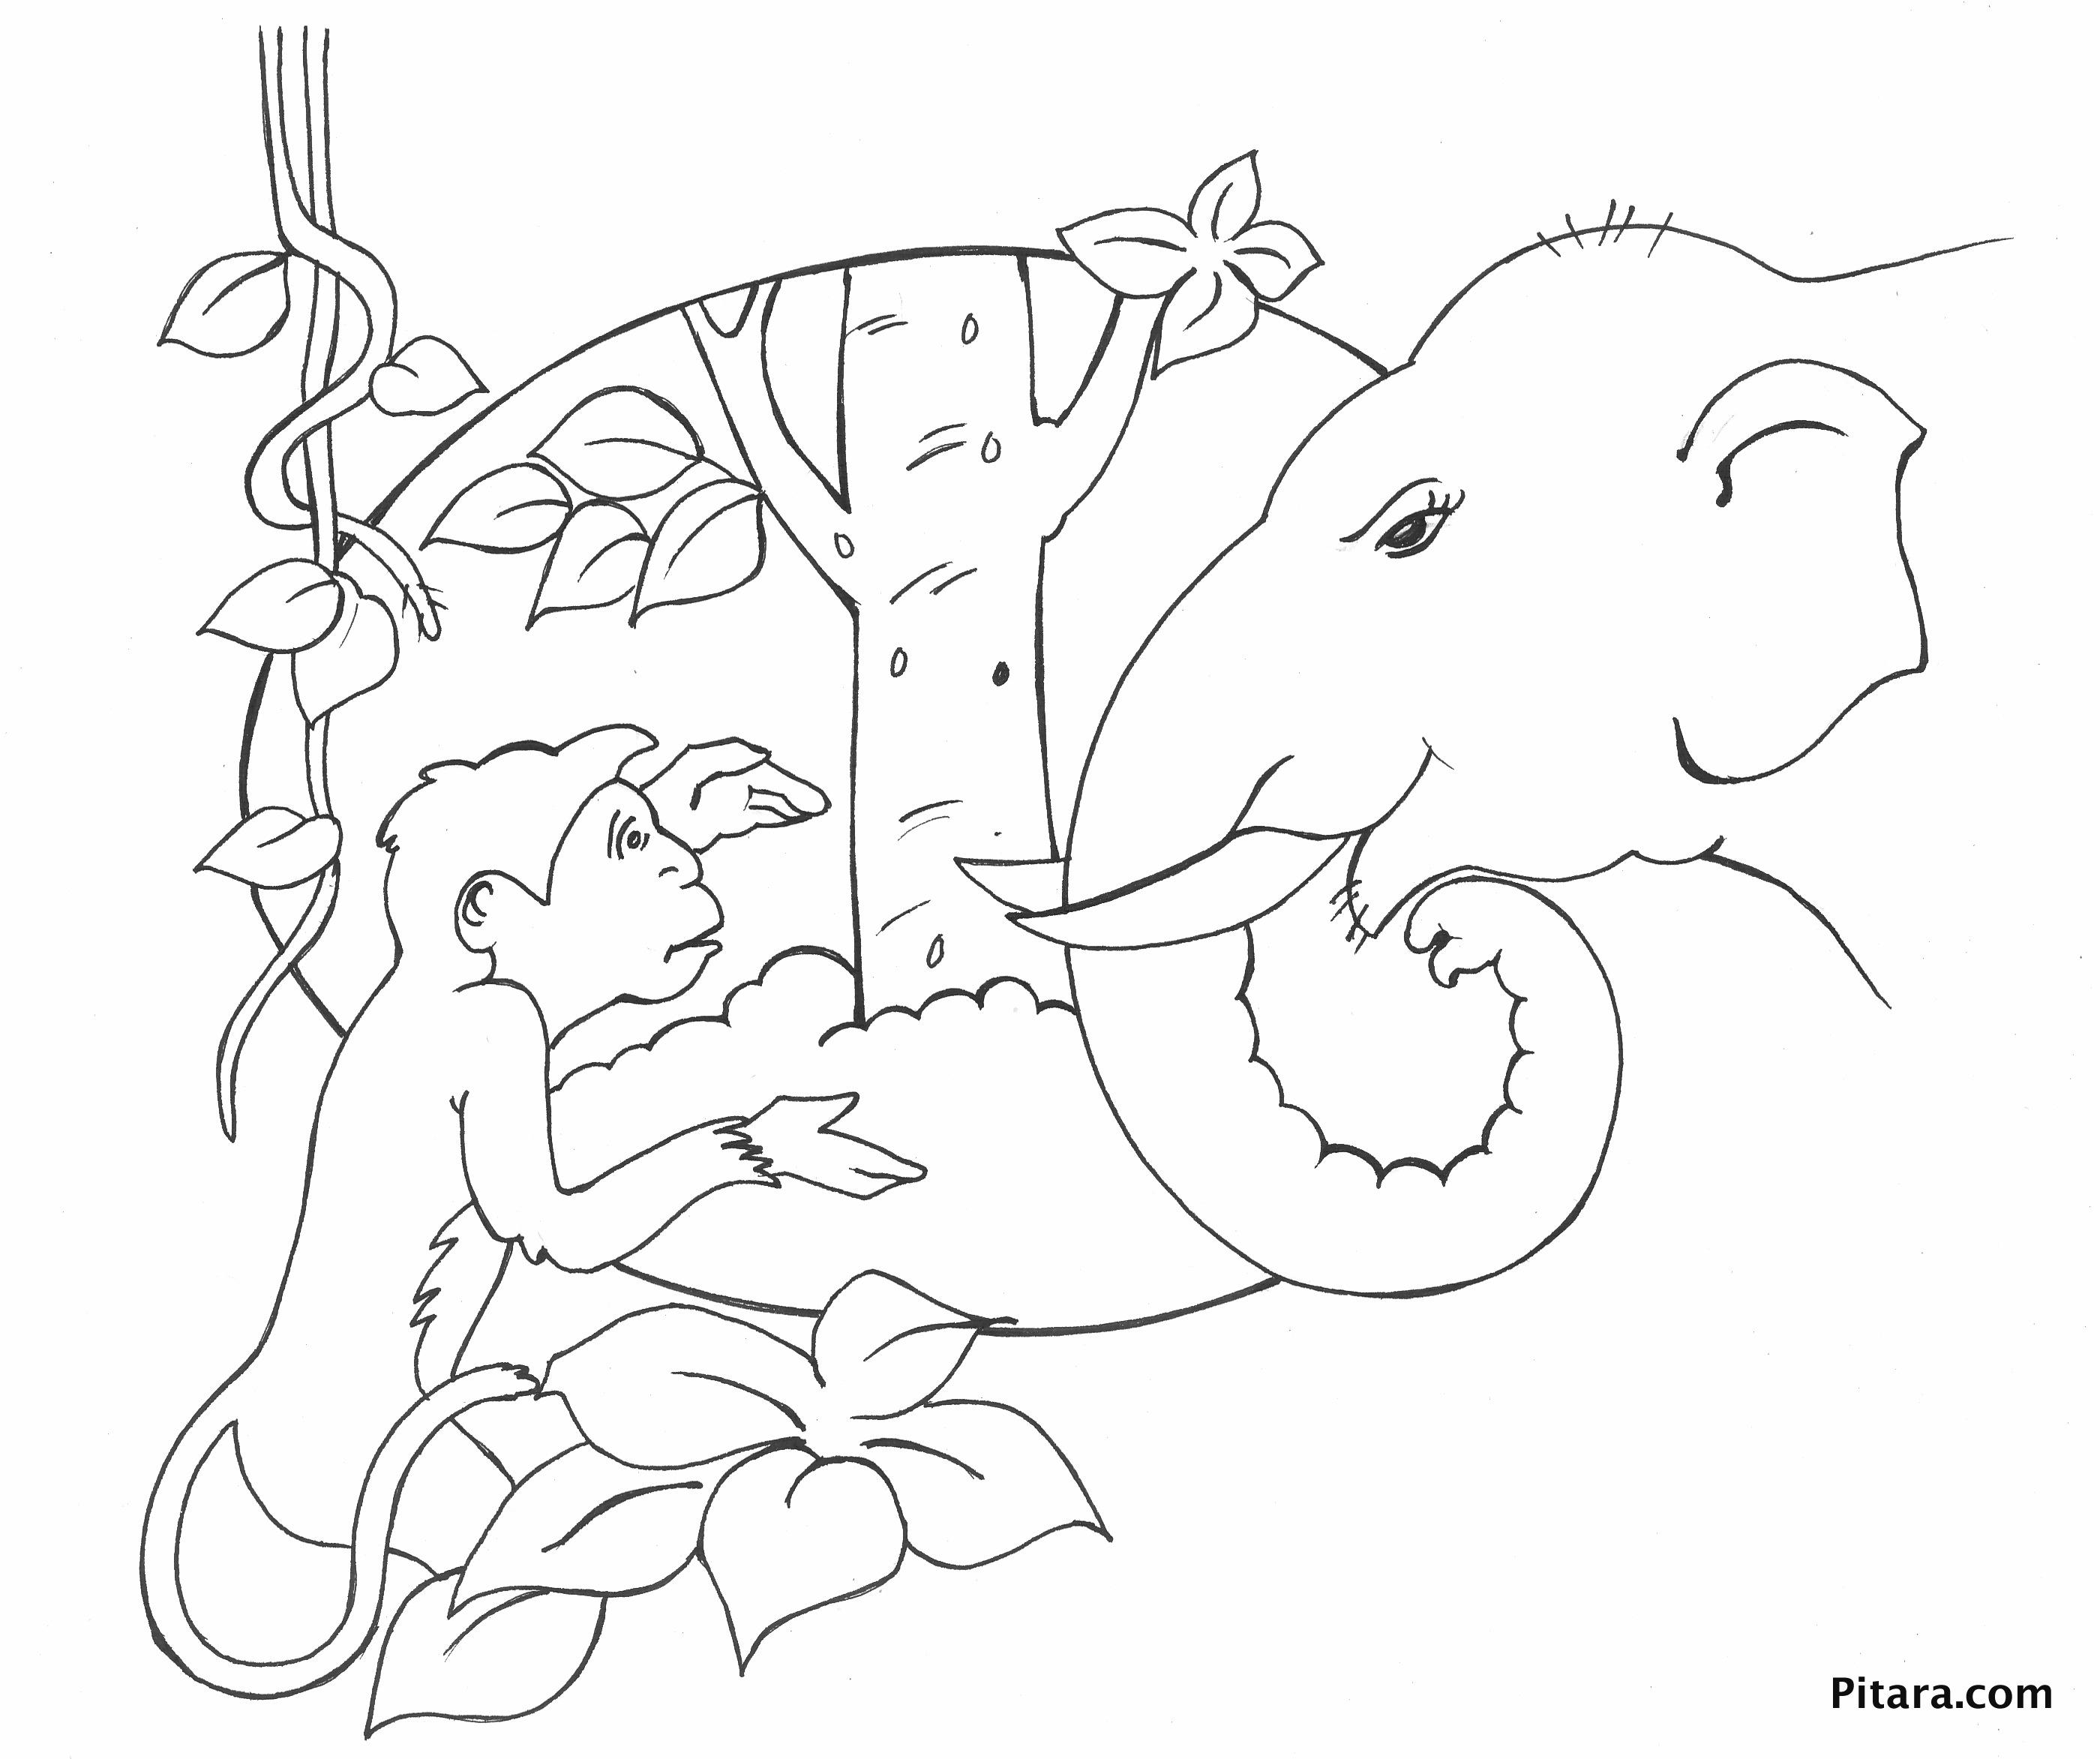 Monkey & elephant